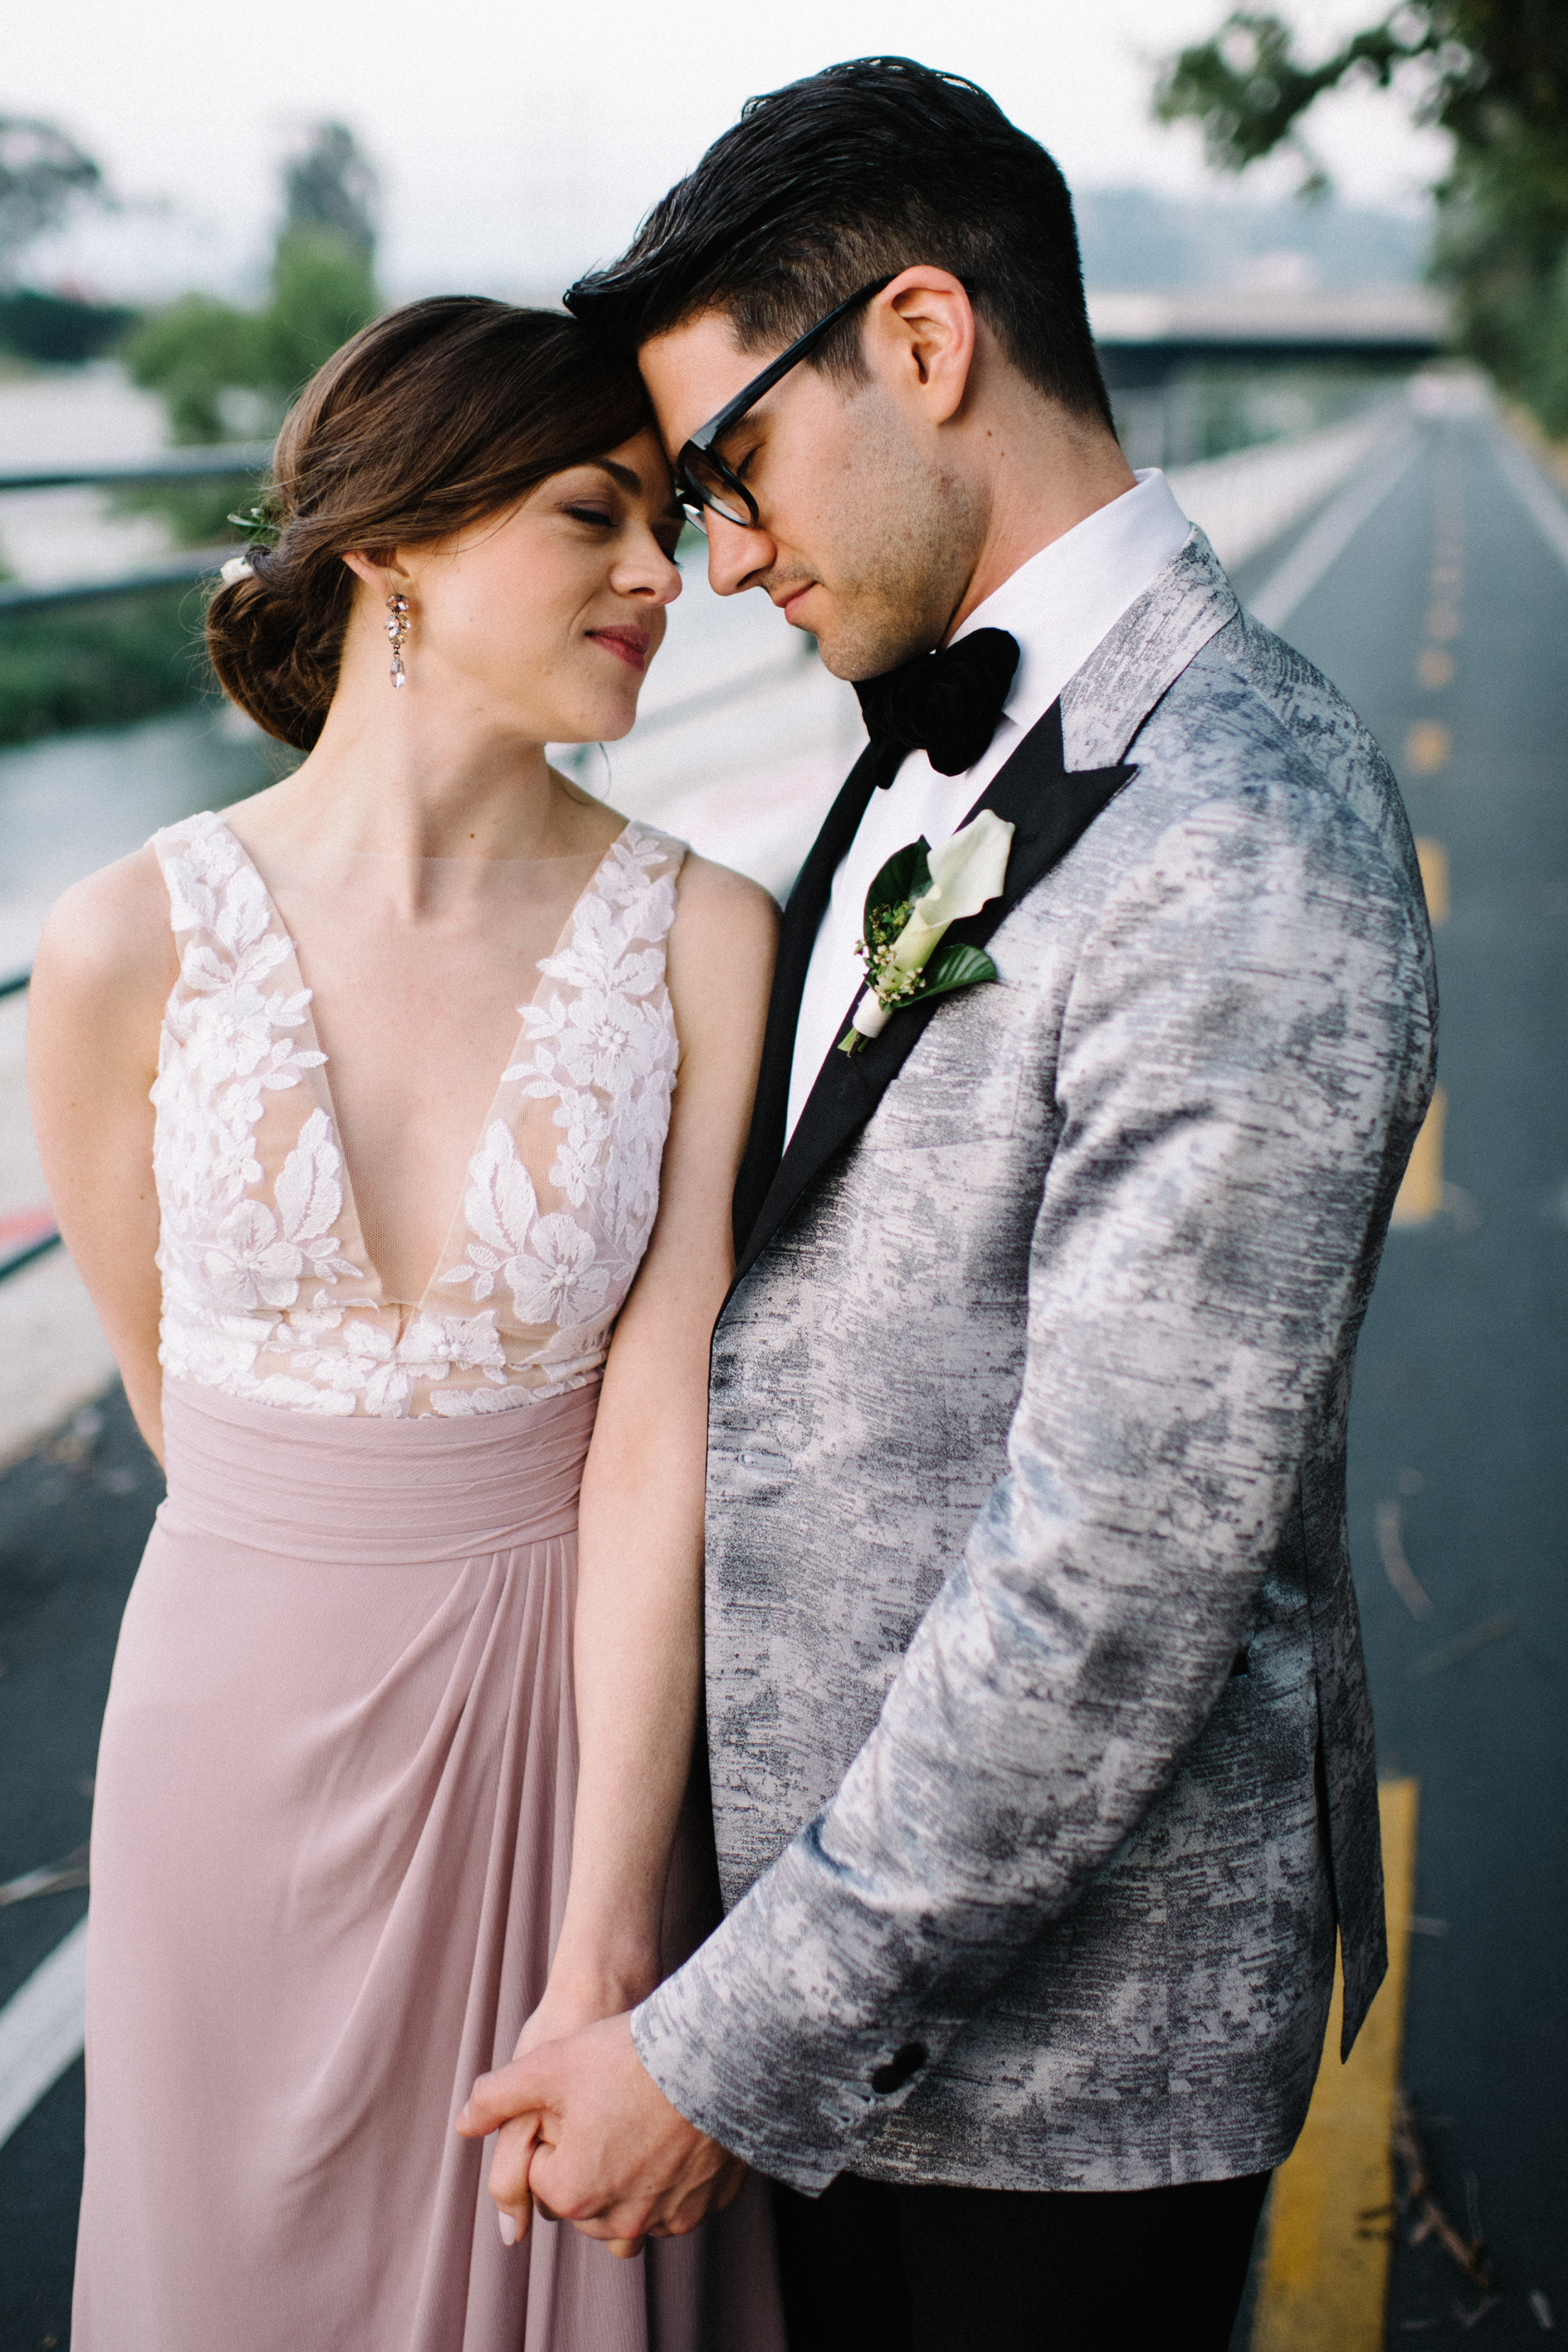 wedding_millwick_los_angeles-44.jpg